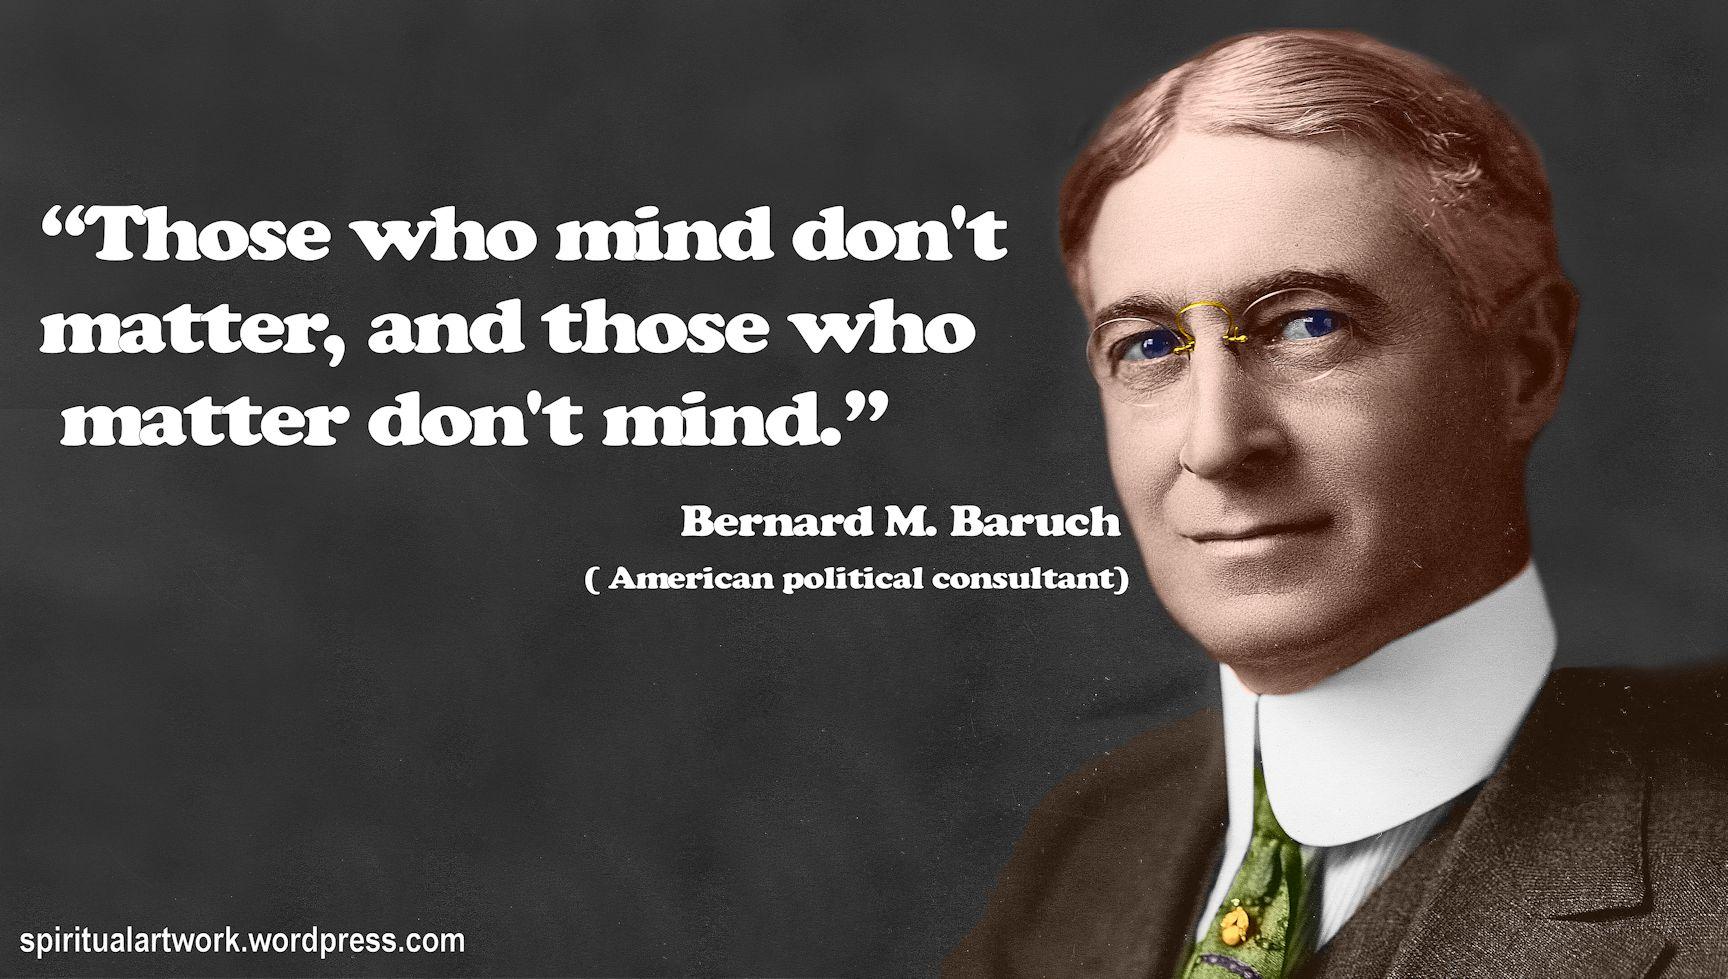 Bernard Baruch's quote #5